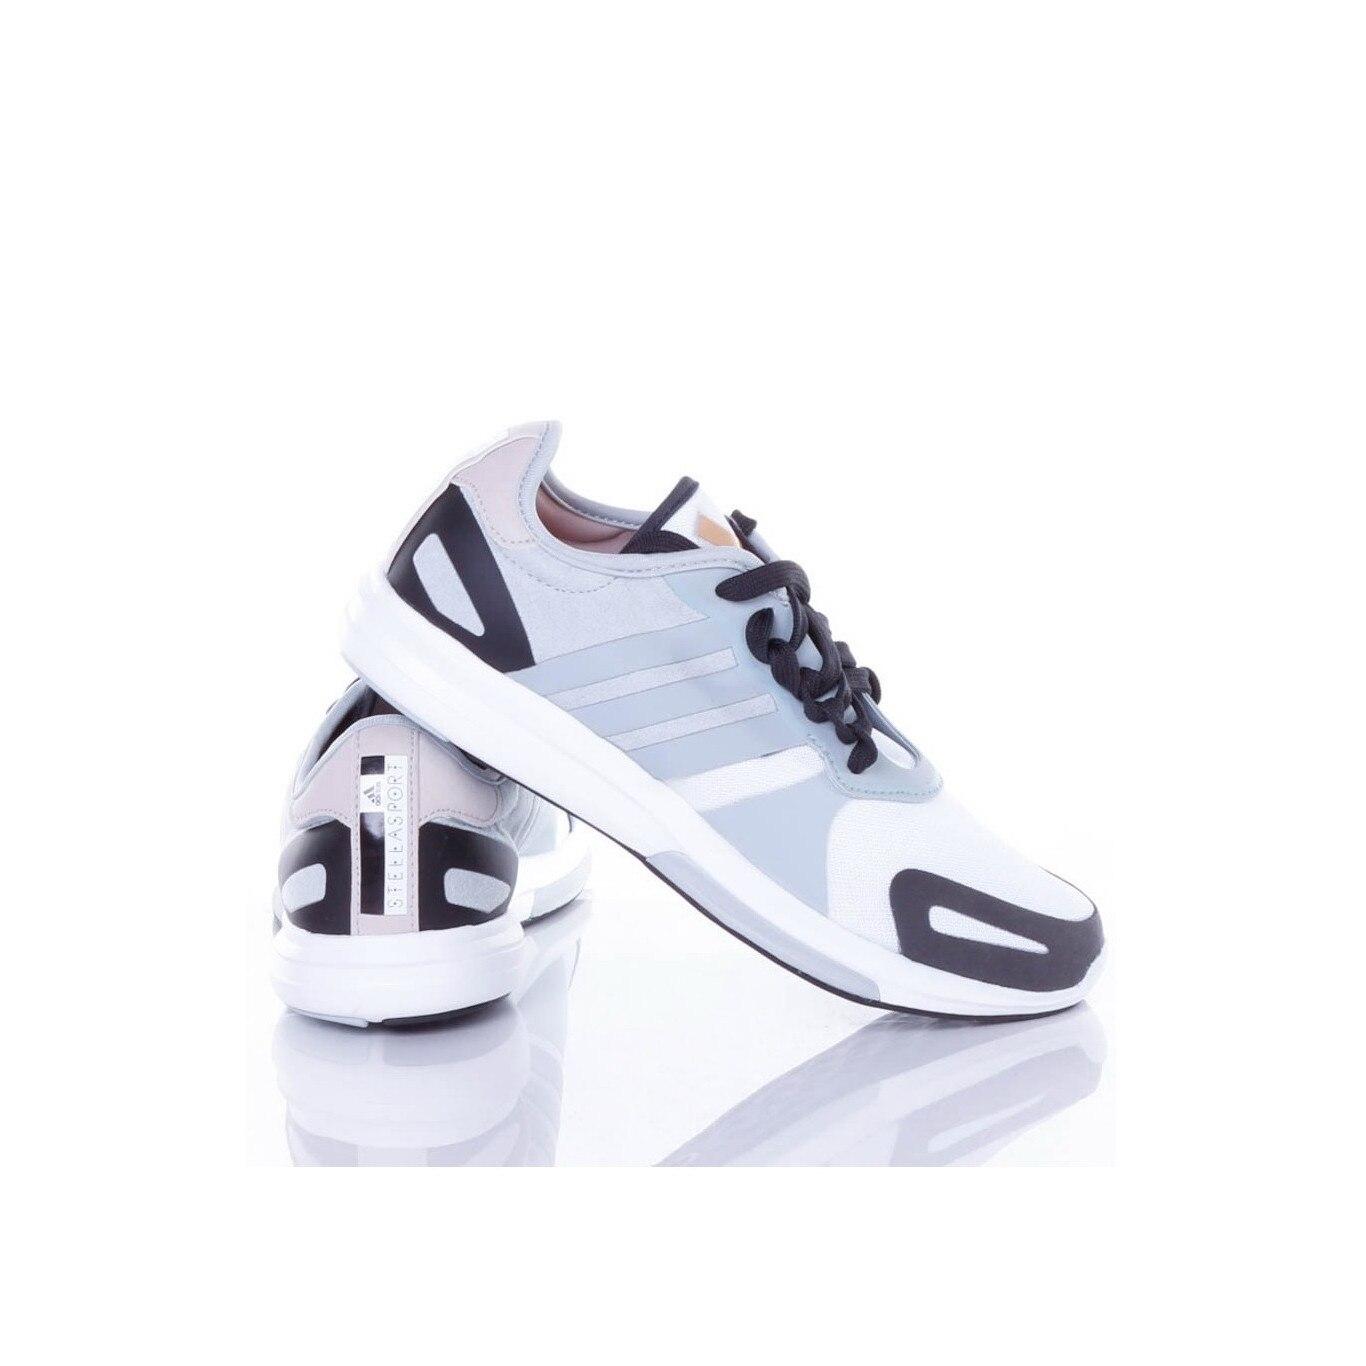 adidas Falcon K Női futócipő 36 lila eMAG.hu